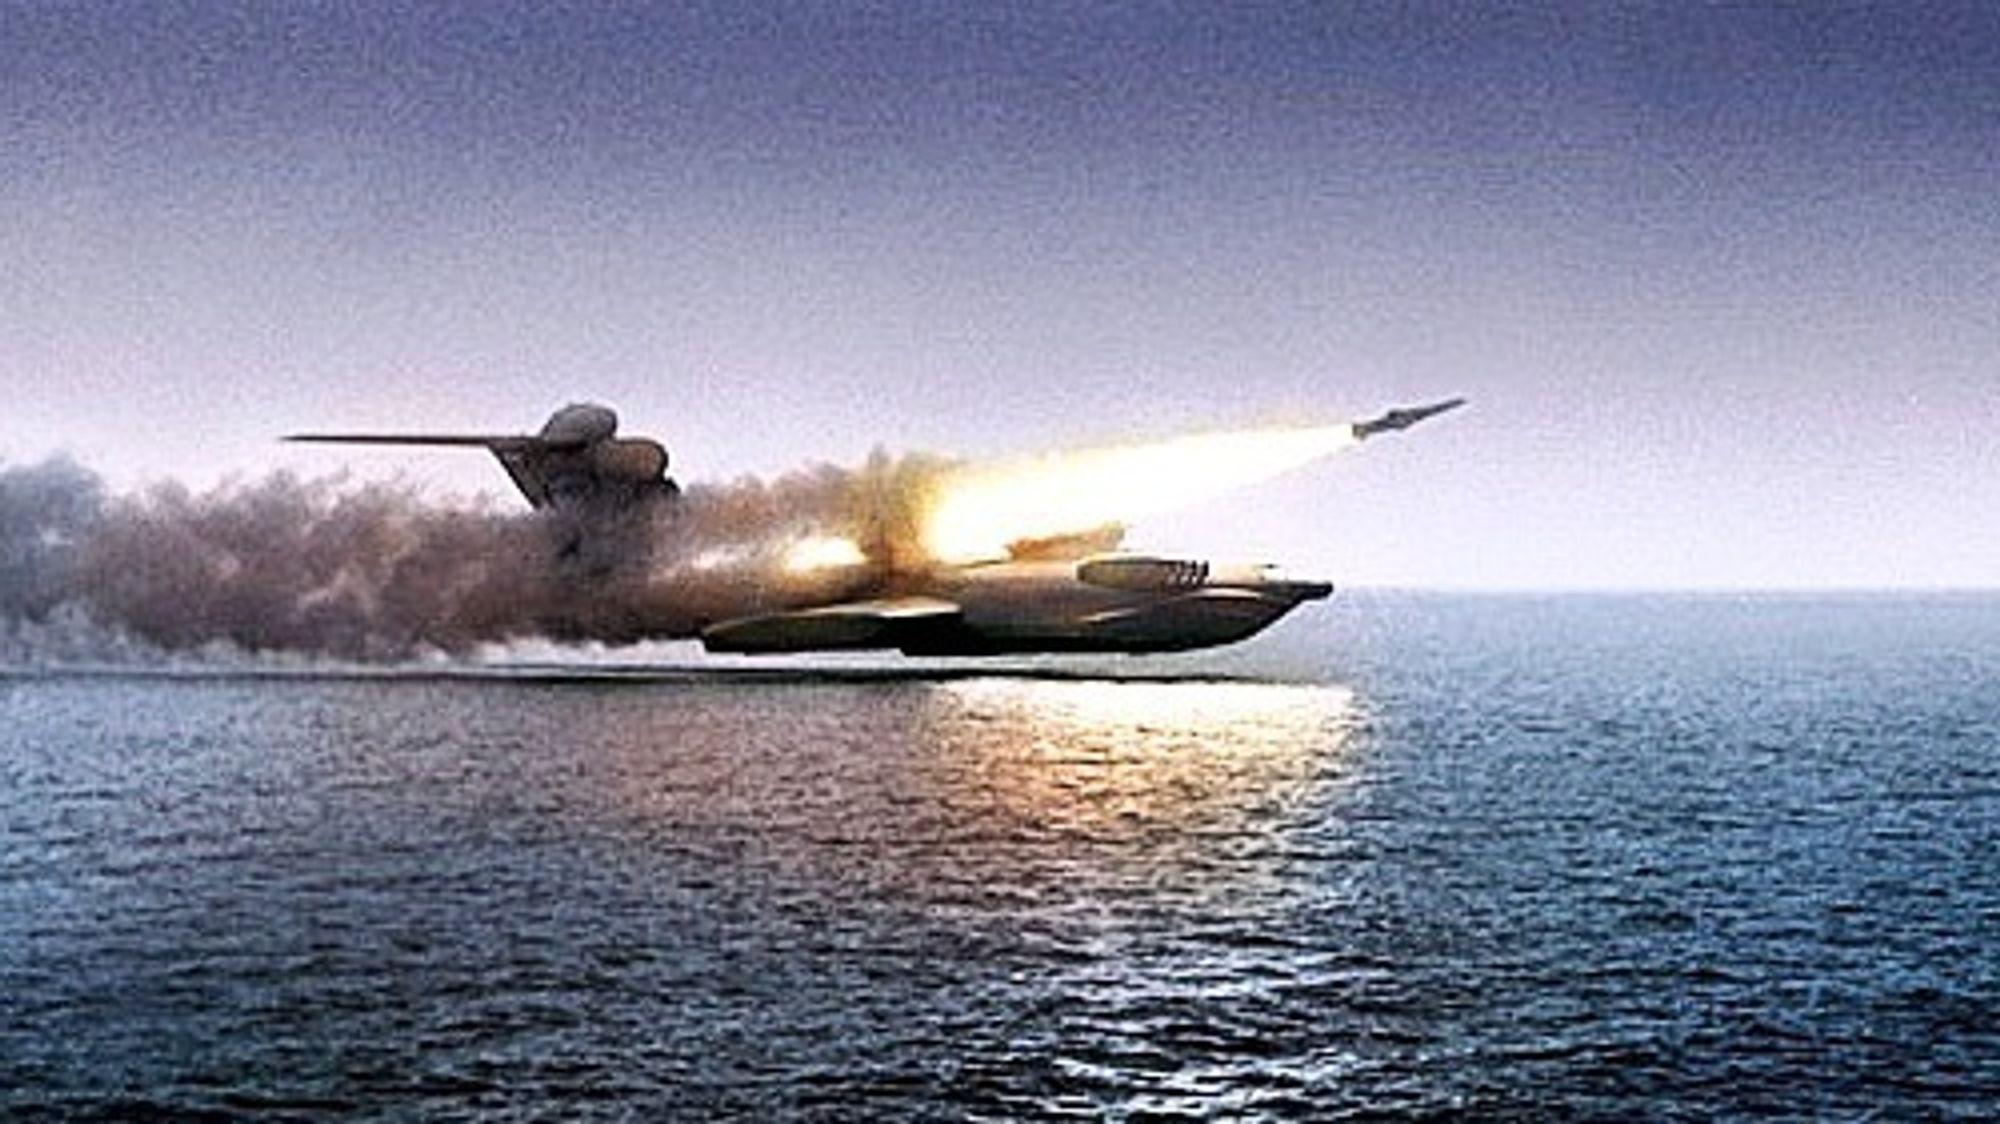 MD-160, det eneste ekranoplanet i Lun-klassen som ble bygget, avfyrer et missil under testing.